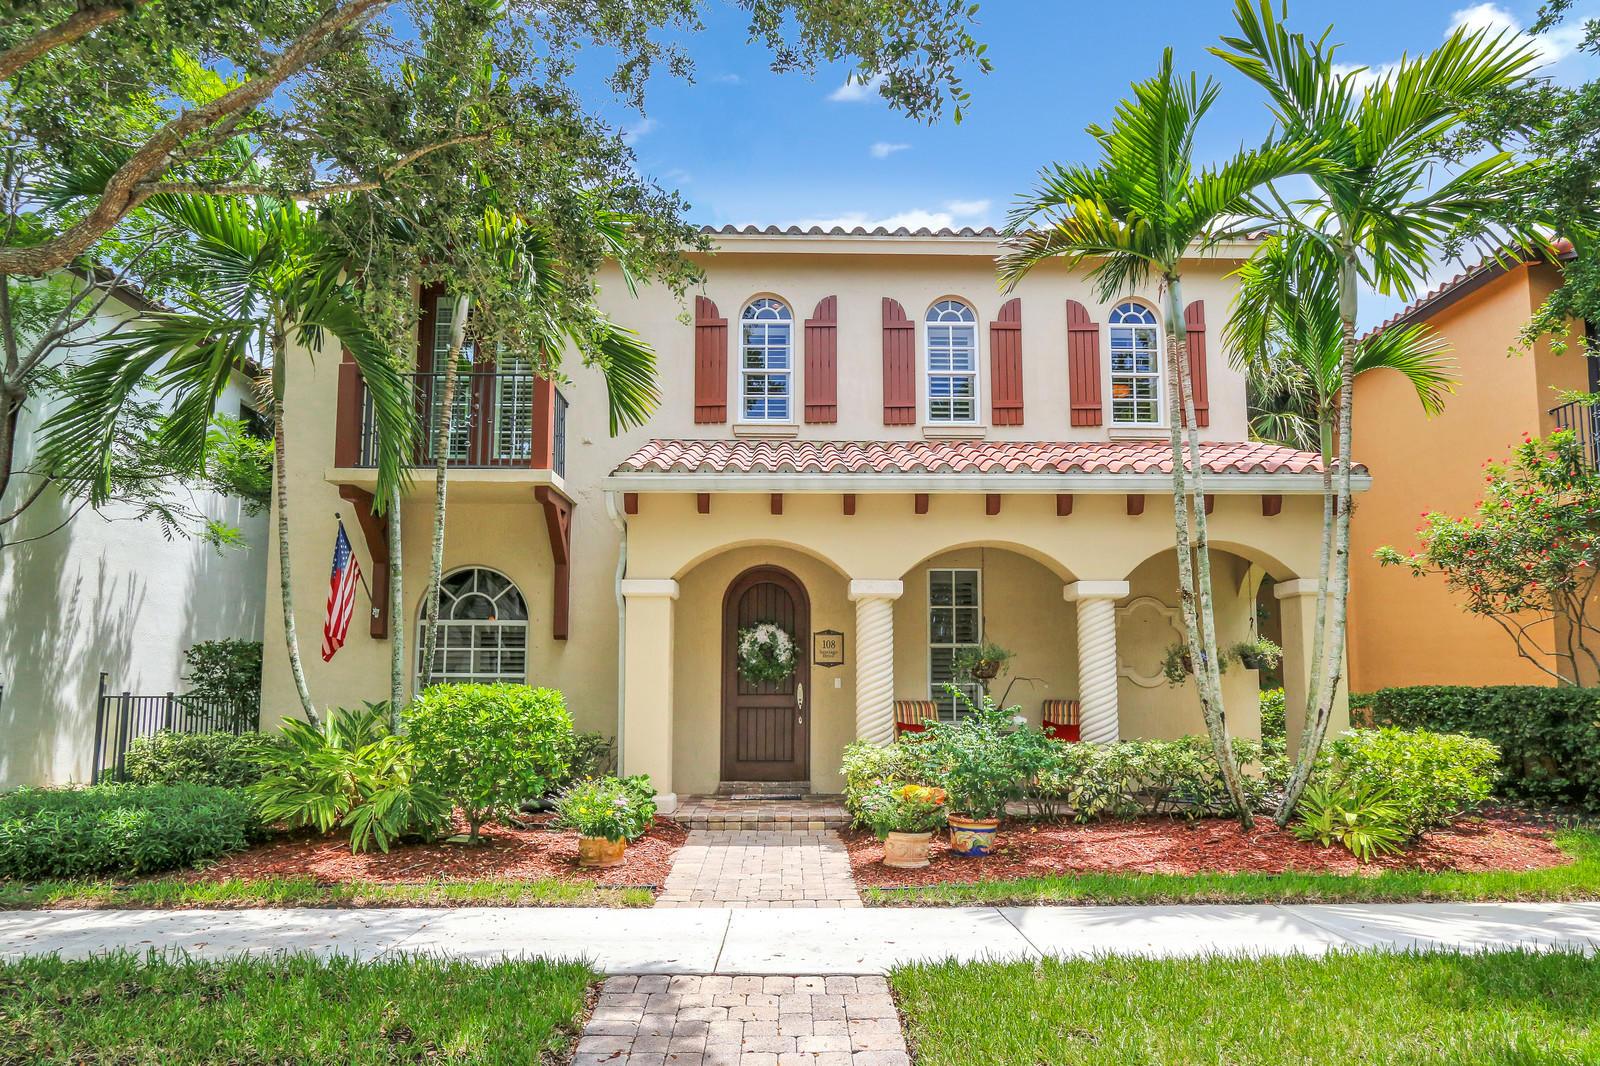 New Home for sale at 108 Santiago Drive in Jupiter